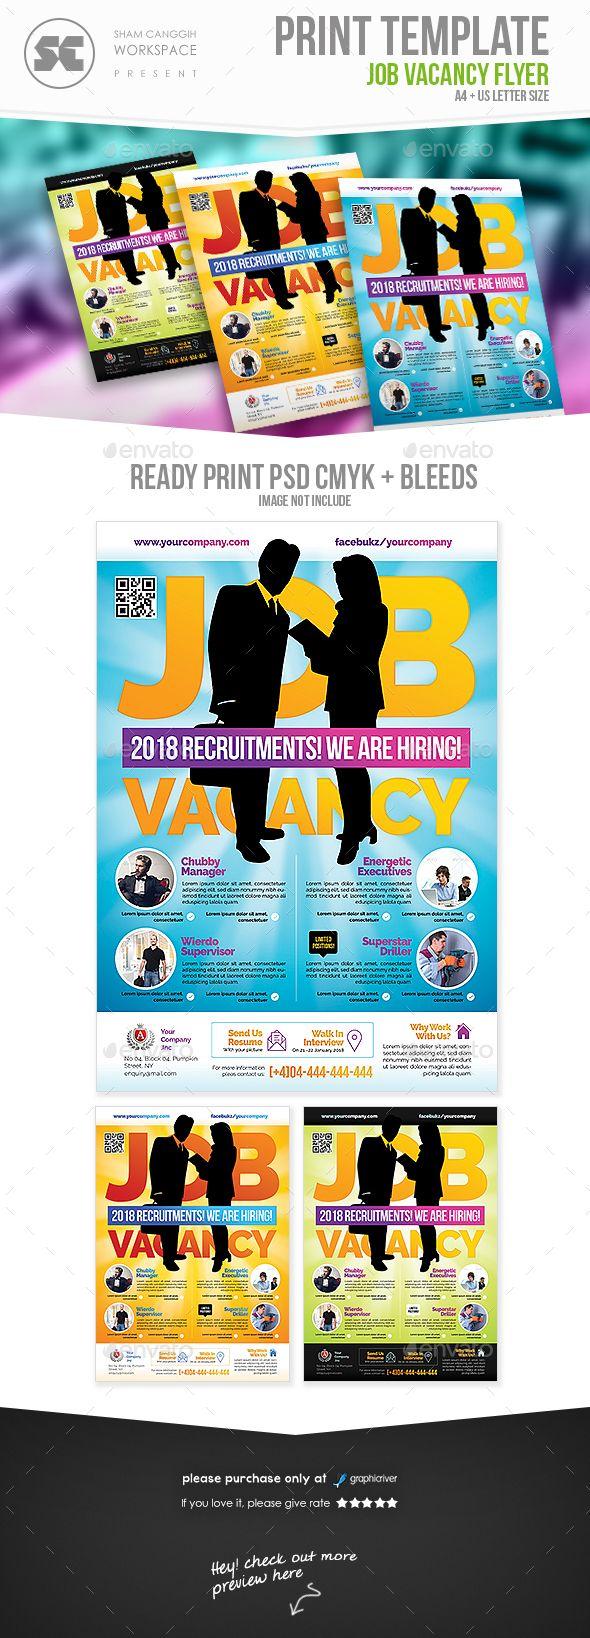 Job Recruitment Flyer Flyer Template Flyer Design Templates And